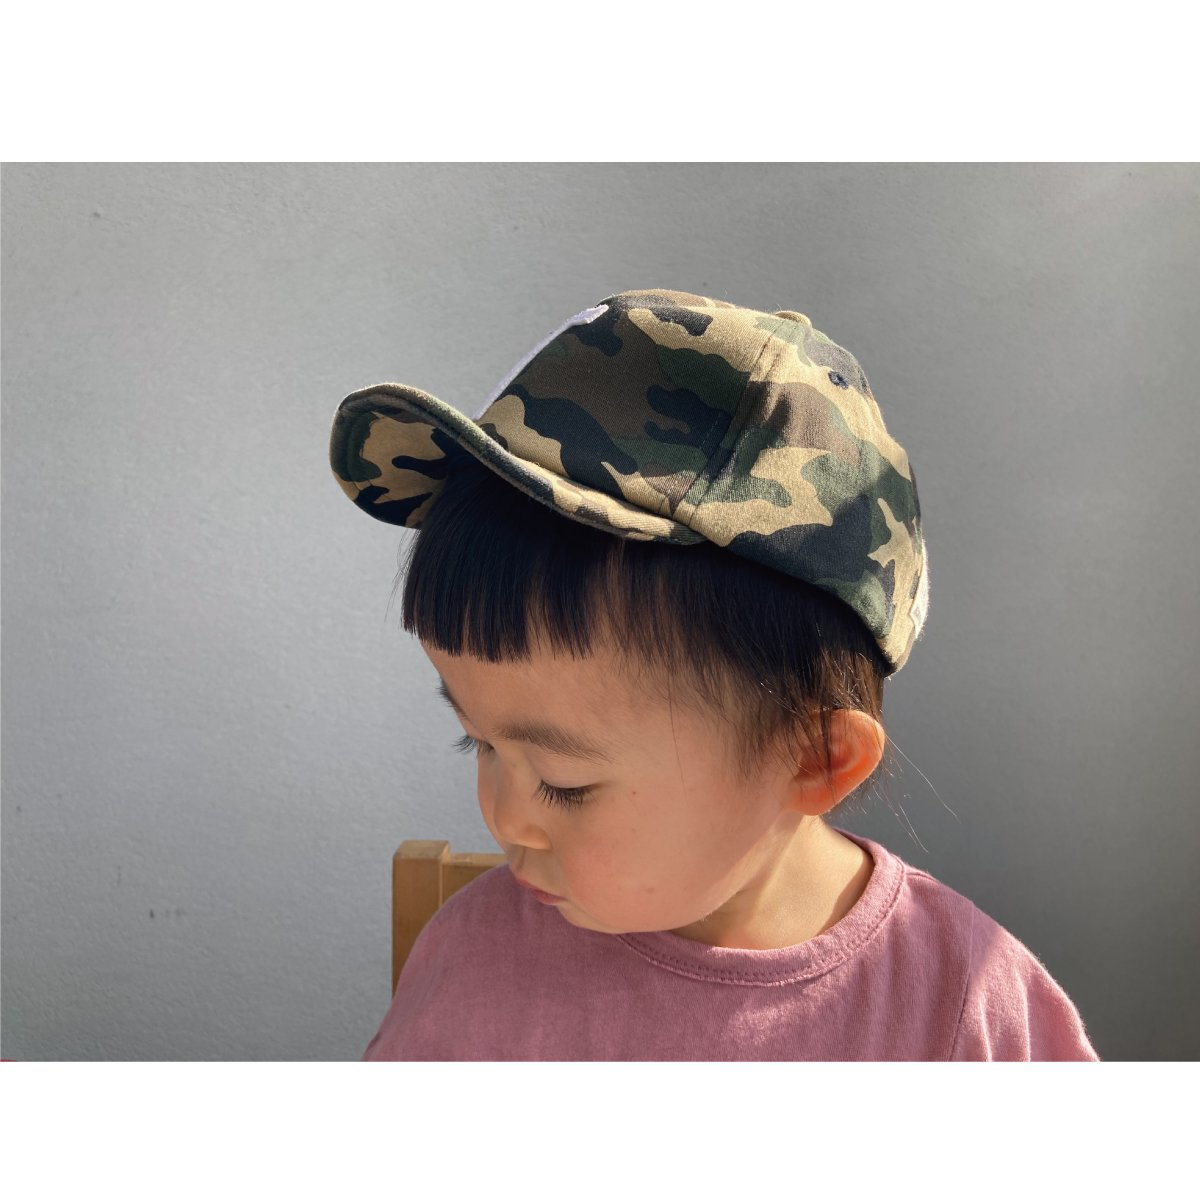 【KIDS】Kids Sim Logo Cap 詳細画像42